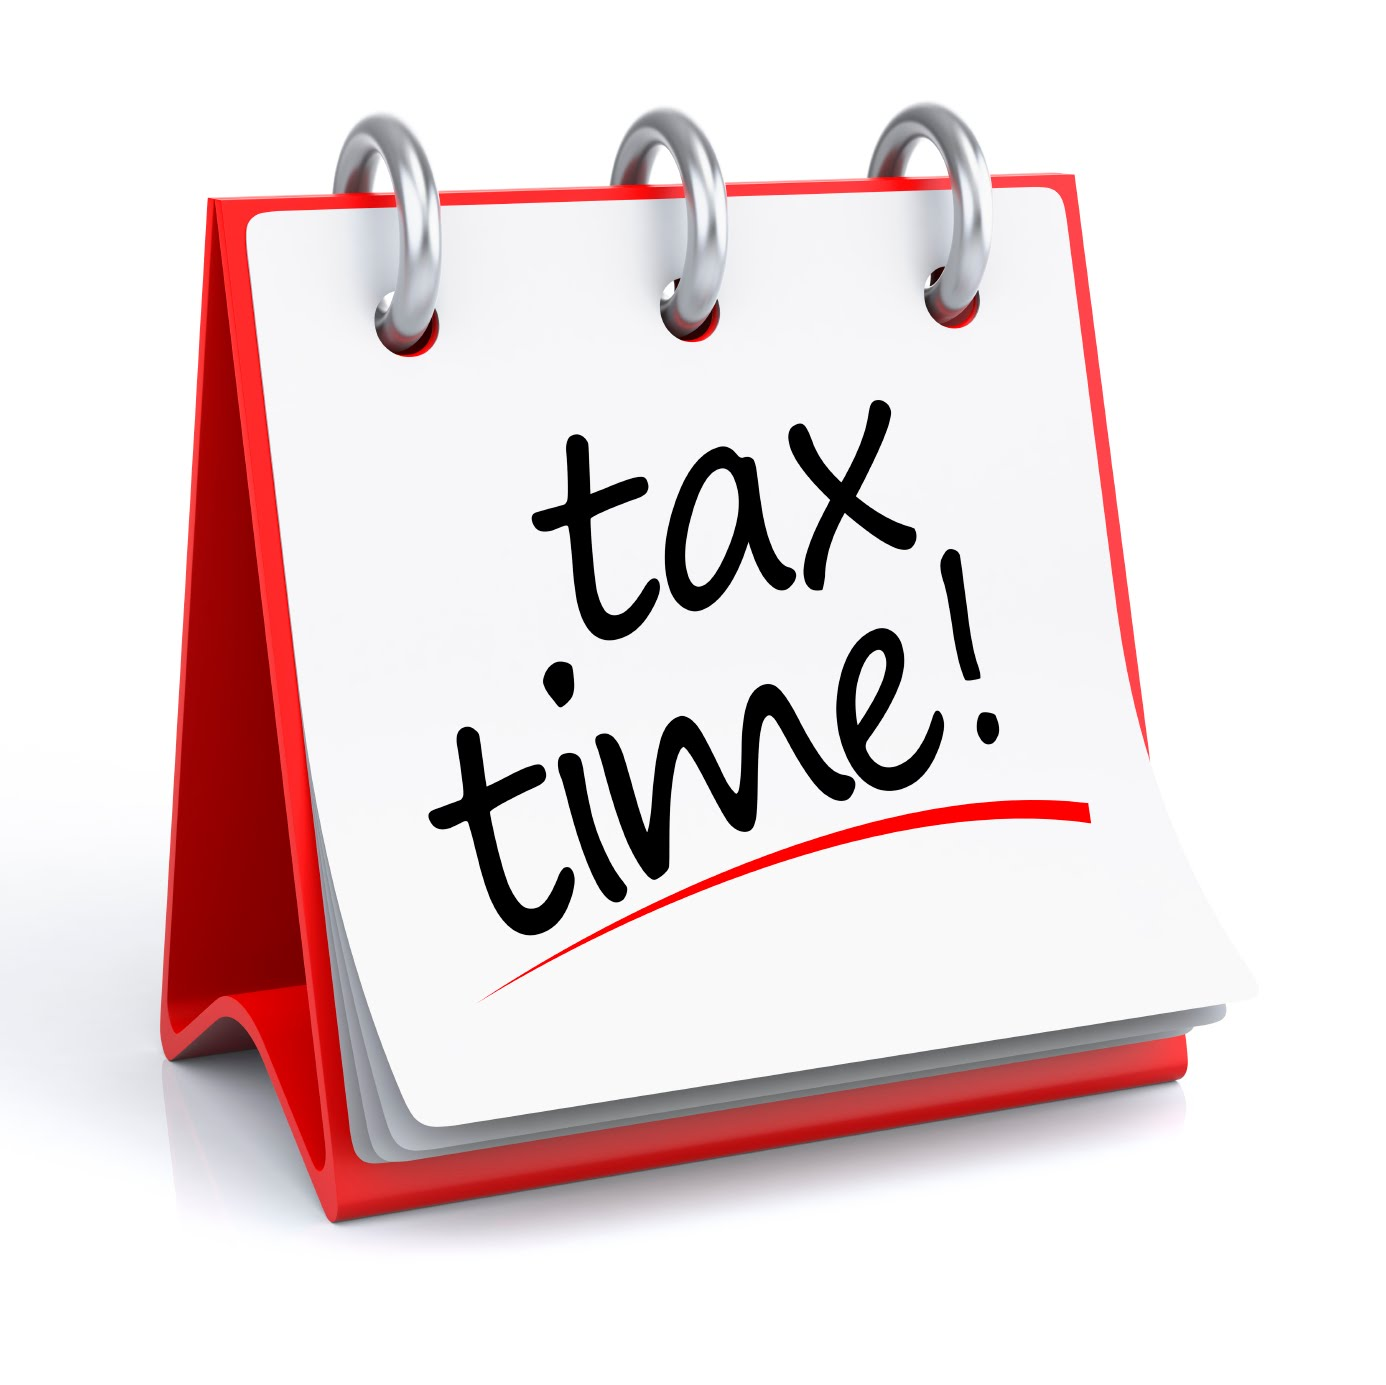 Free Tax Prep Cliparts, Download Free Clip Art, Free Clip Art on.